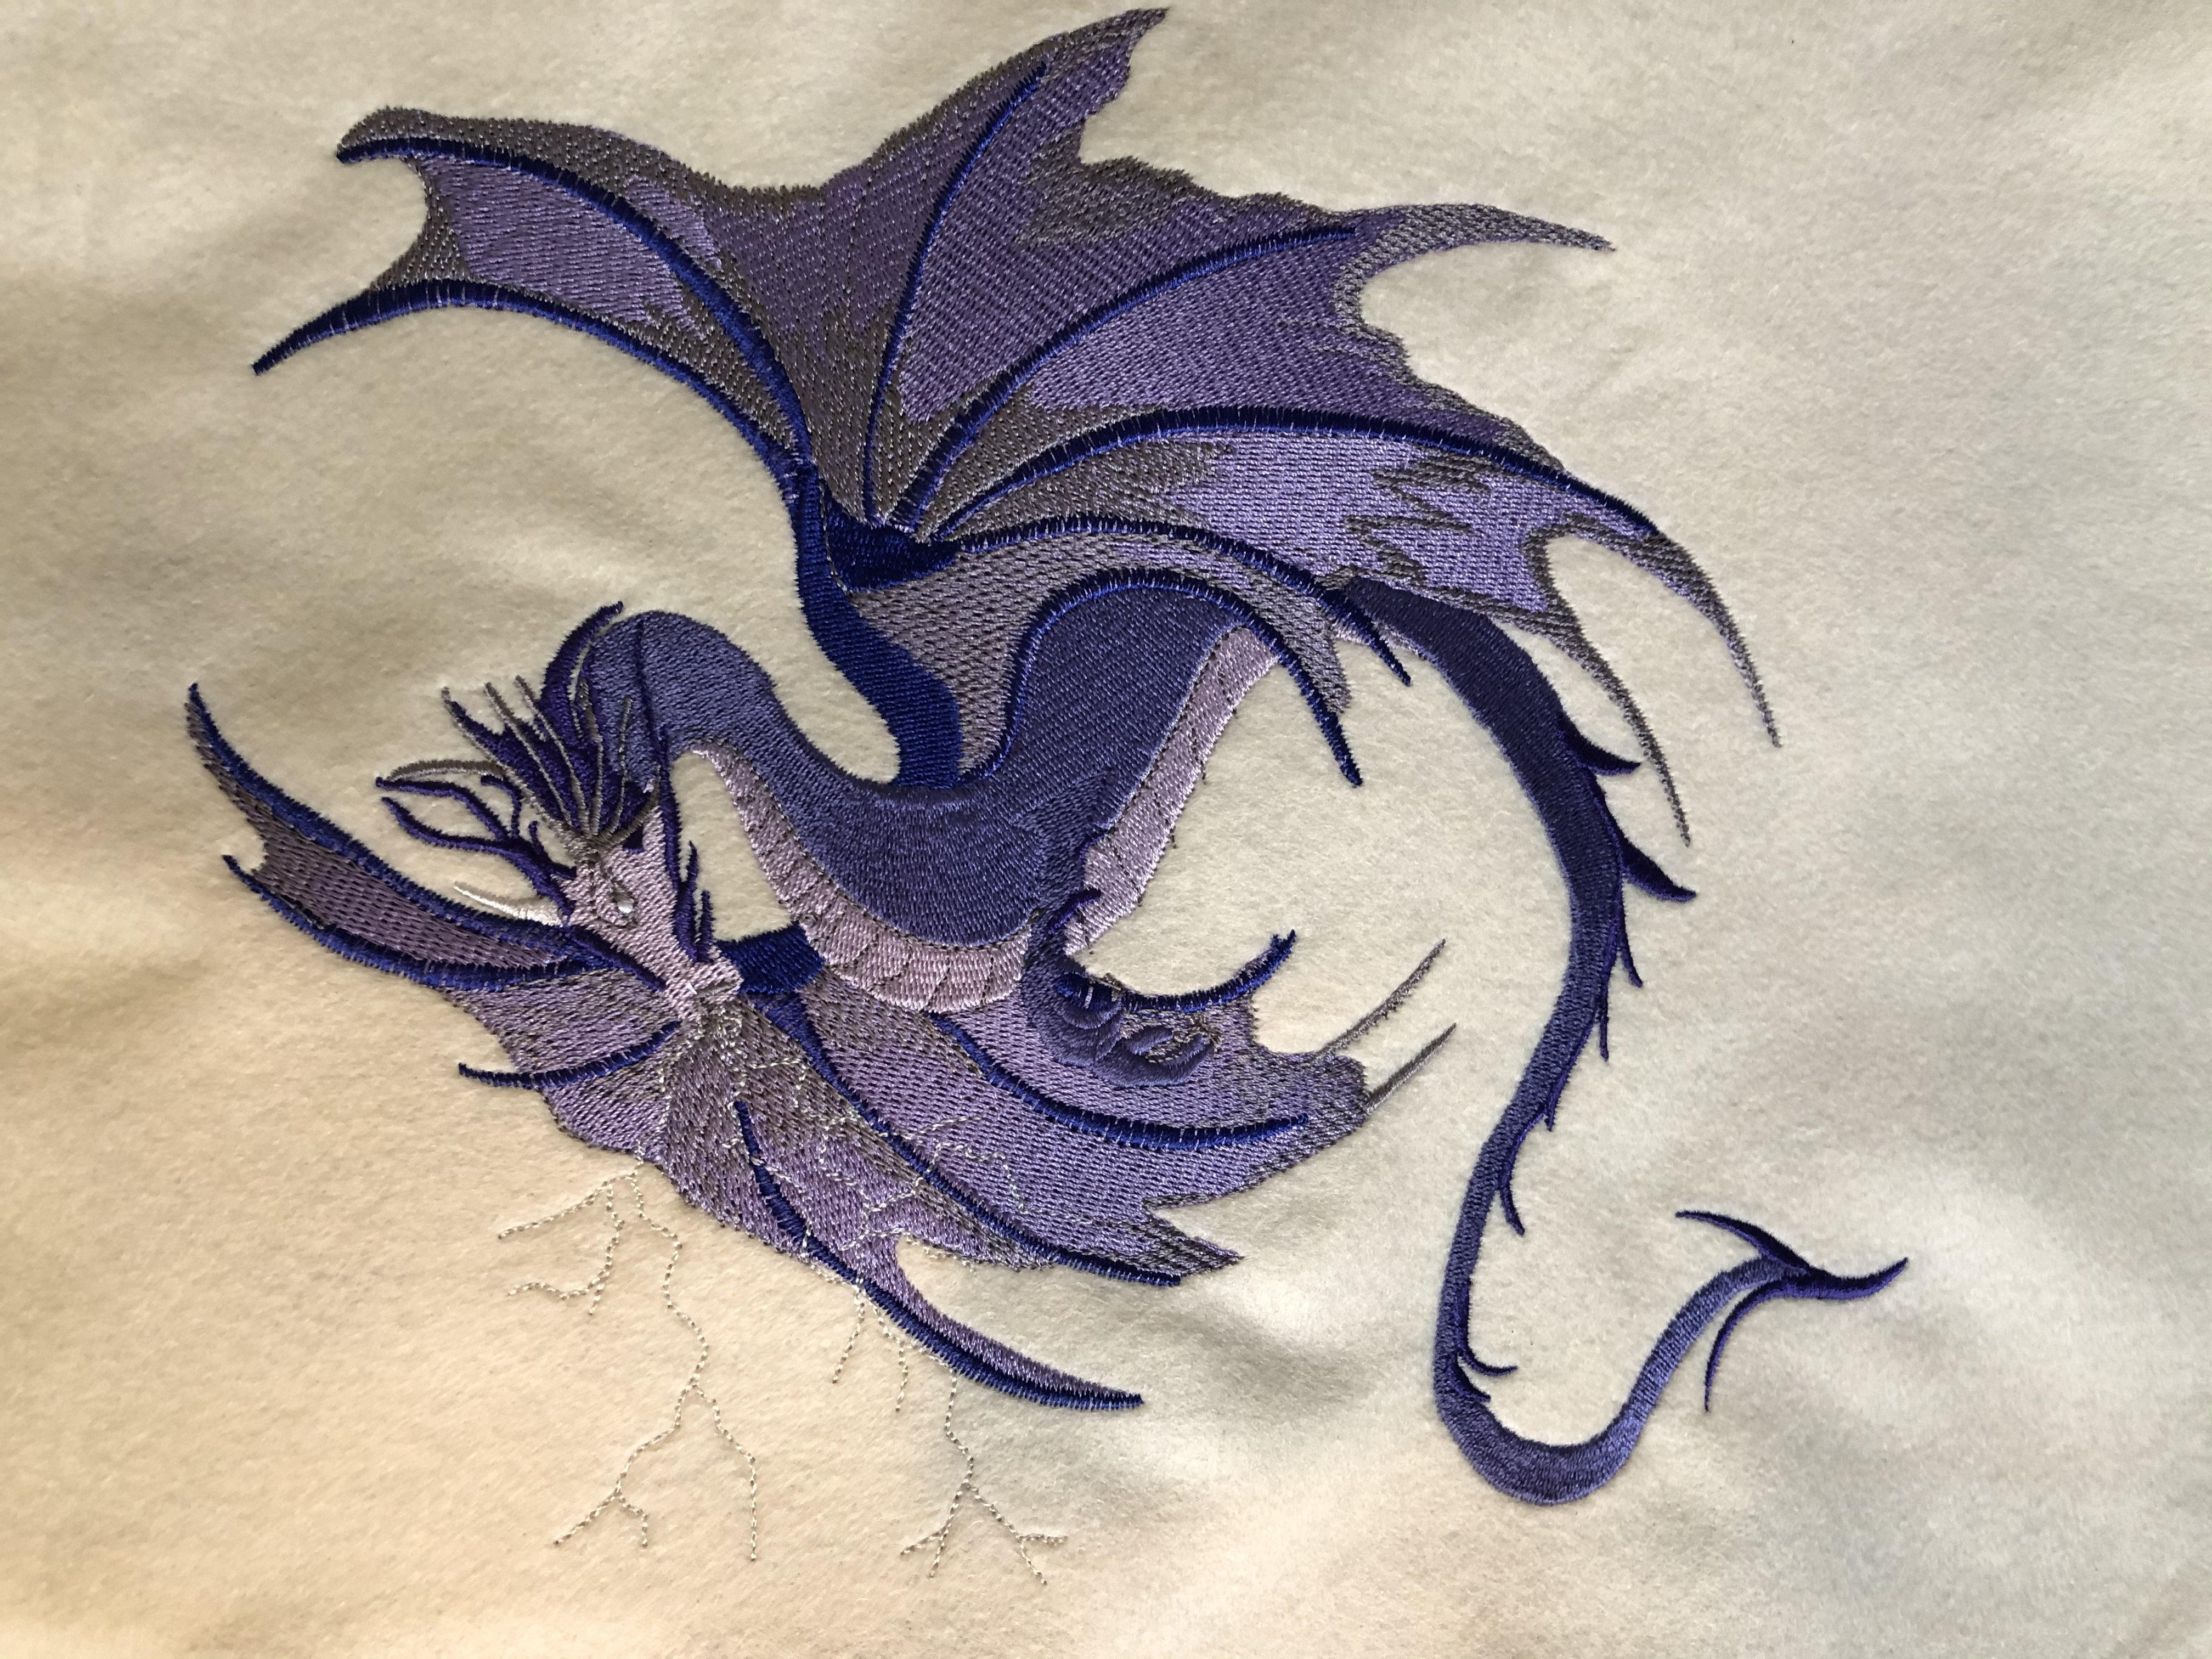 Embroidery/IMG_7280.JPG